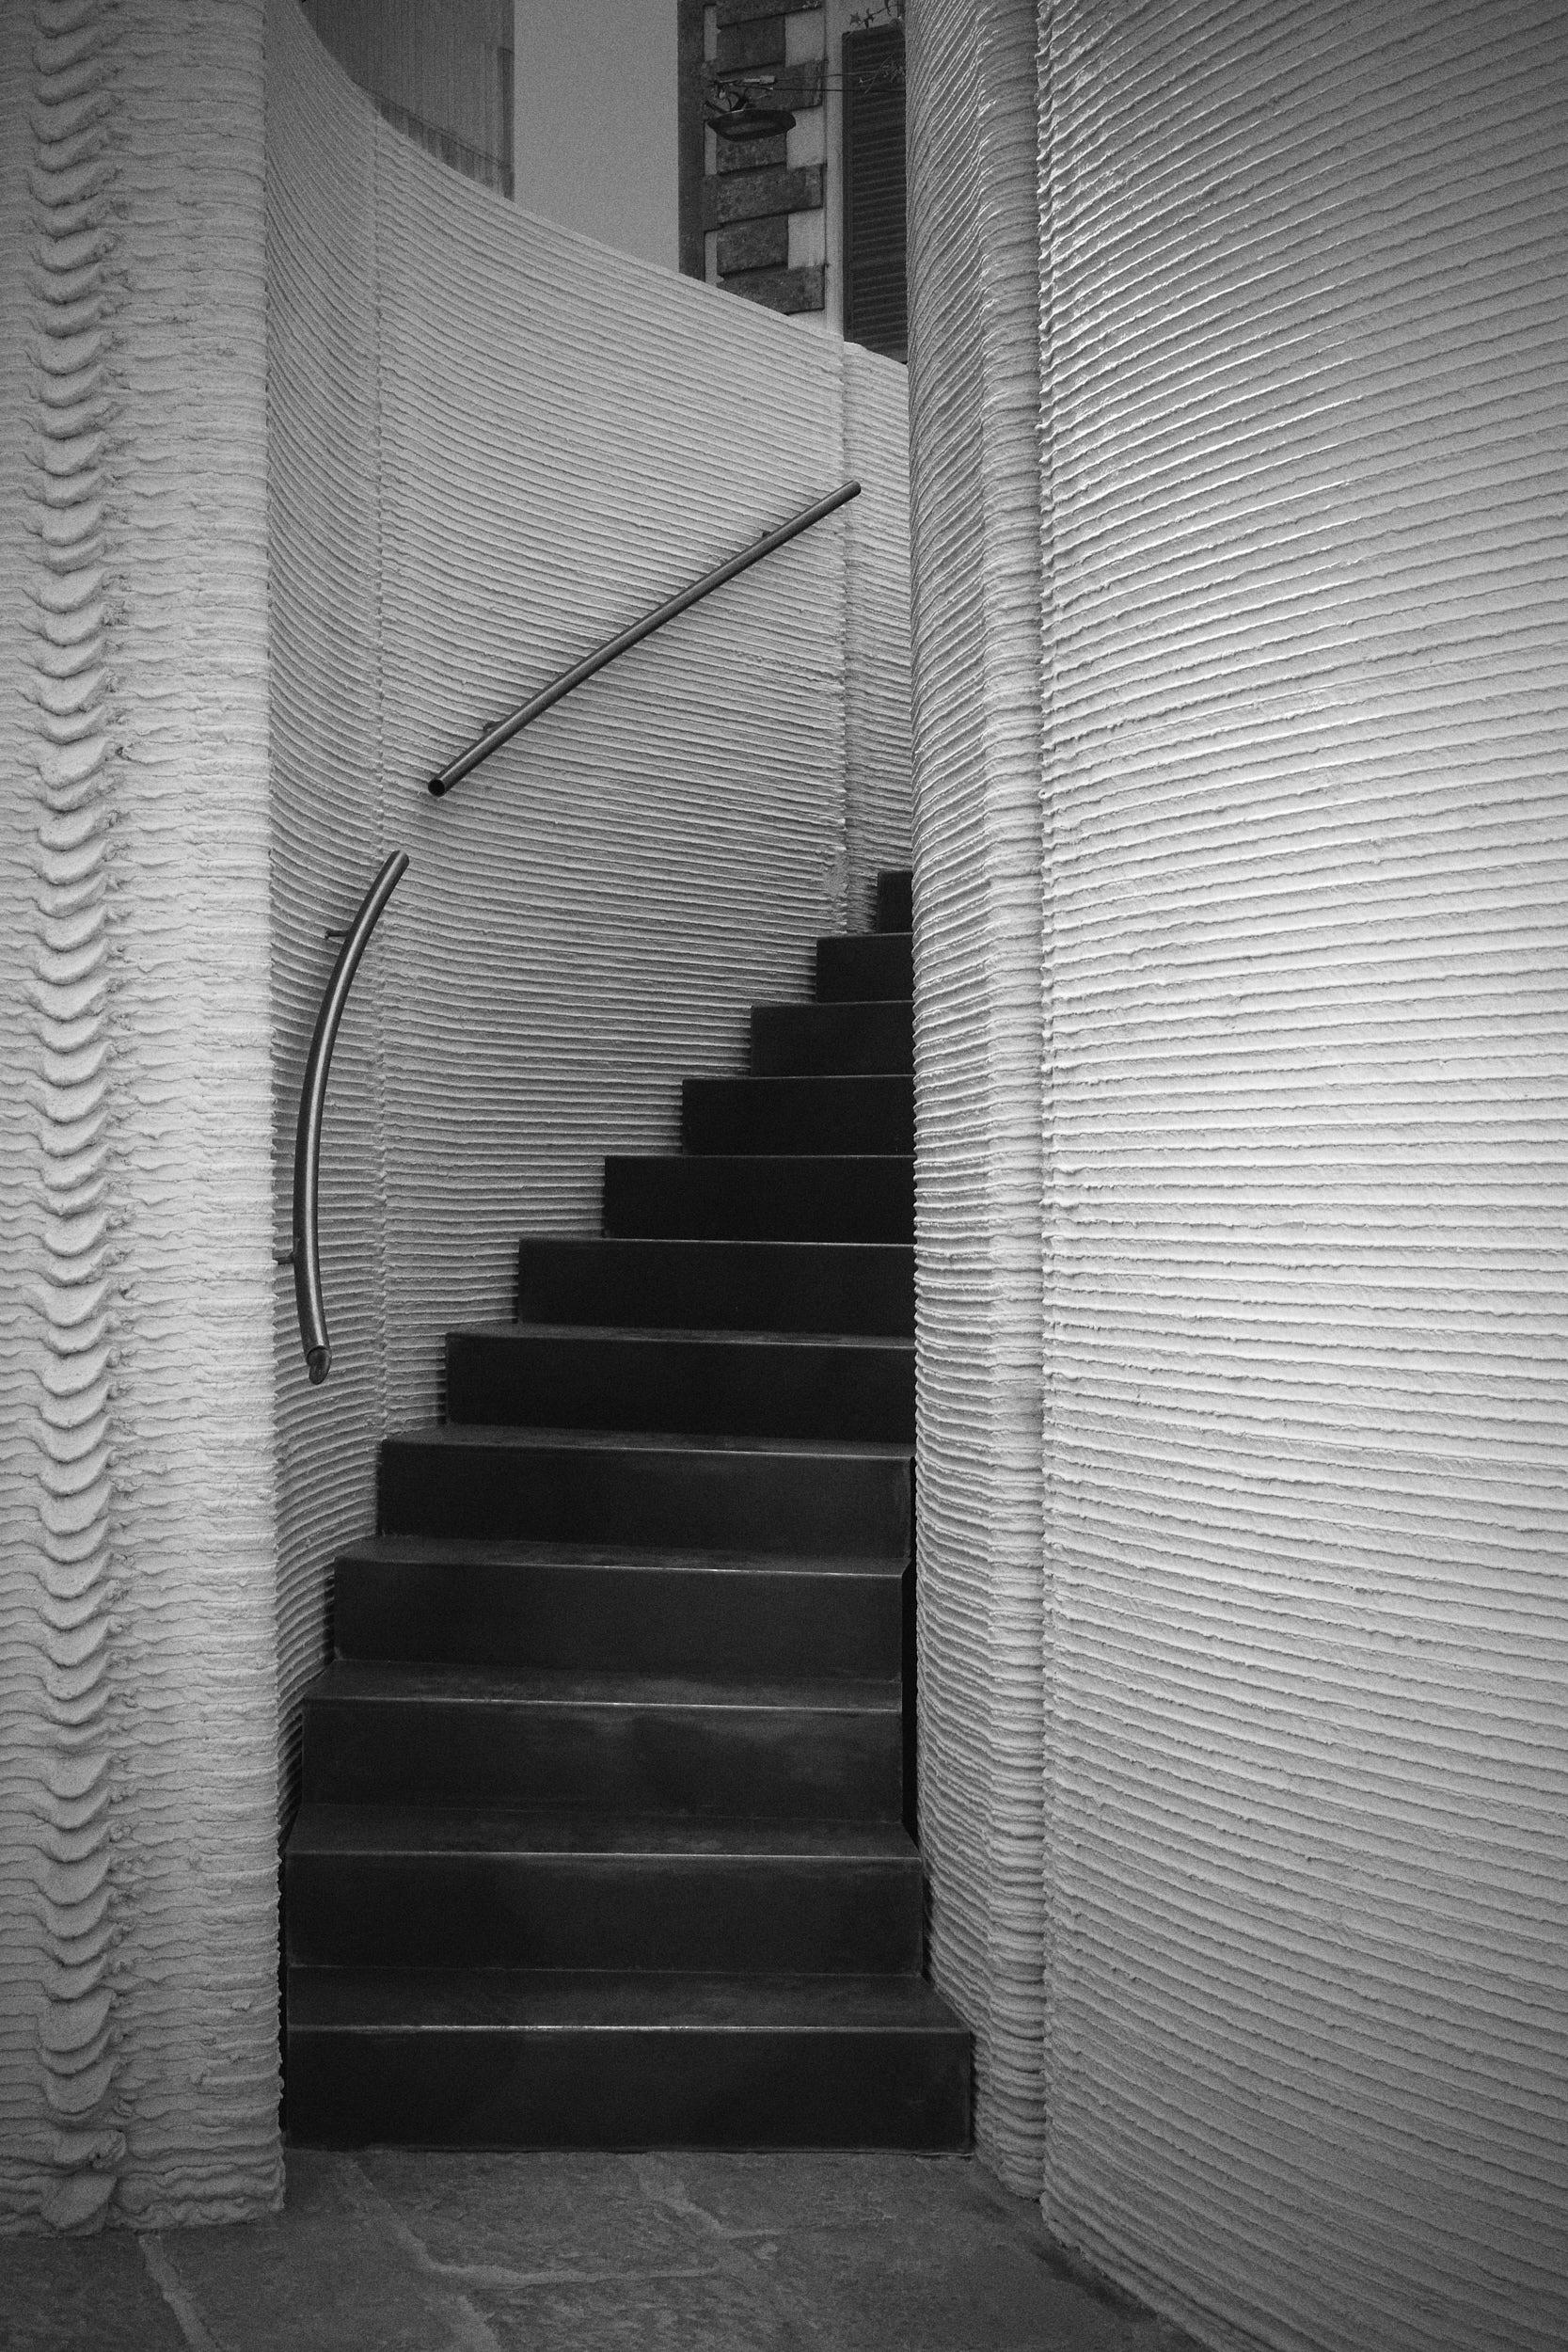 3D Housing 05 by CLS Architetti on Anniversary Magazine. Photo by Alex Lesage — threefold 12.jpg